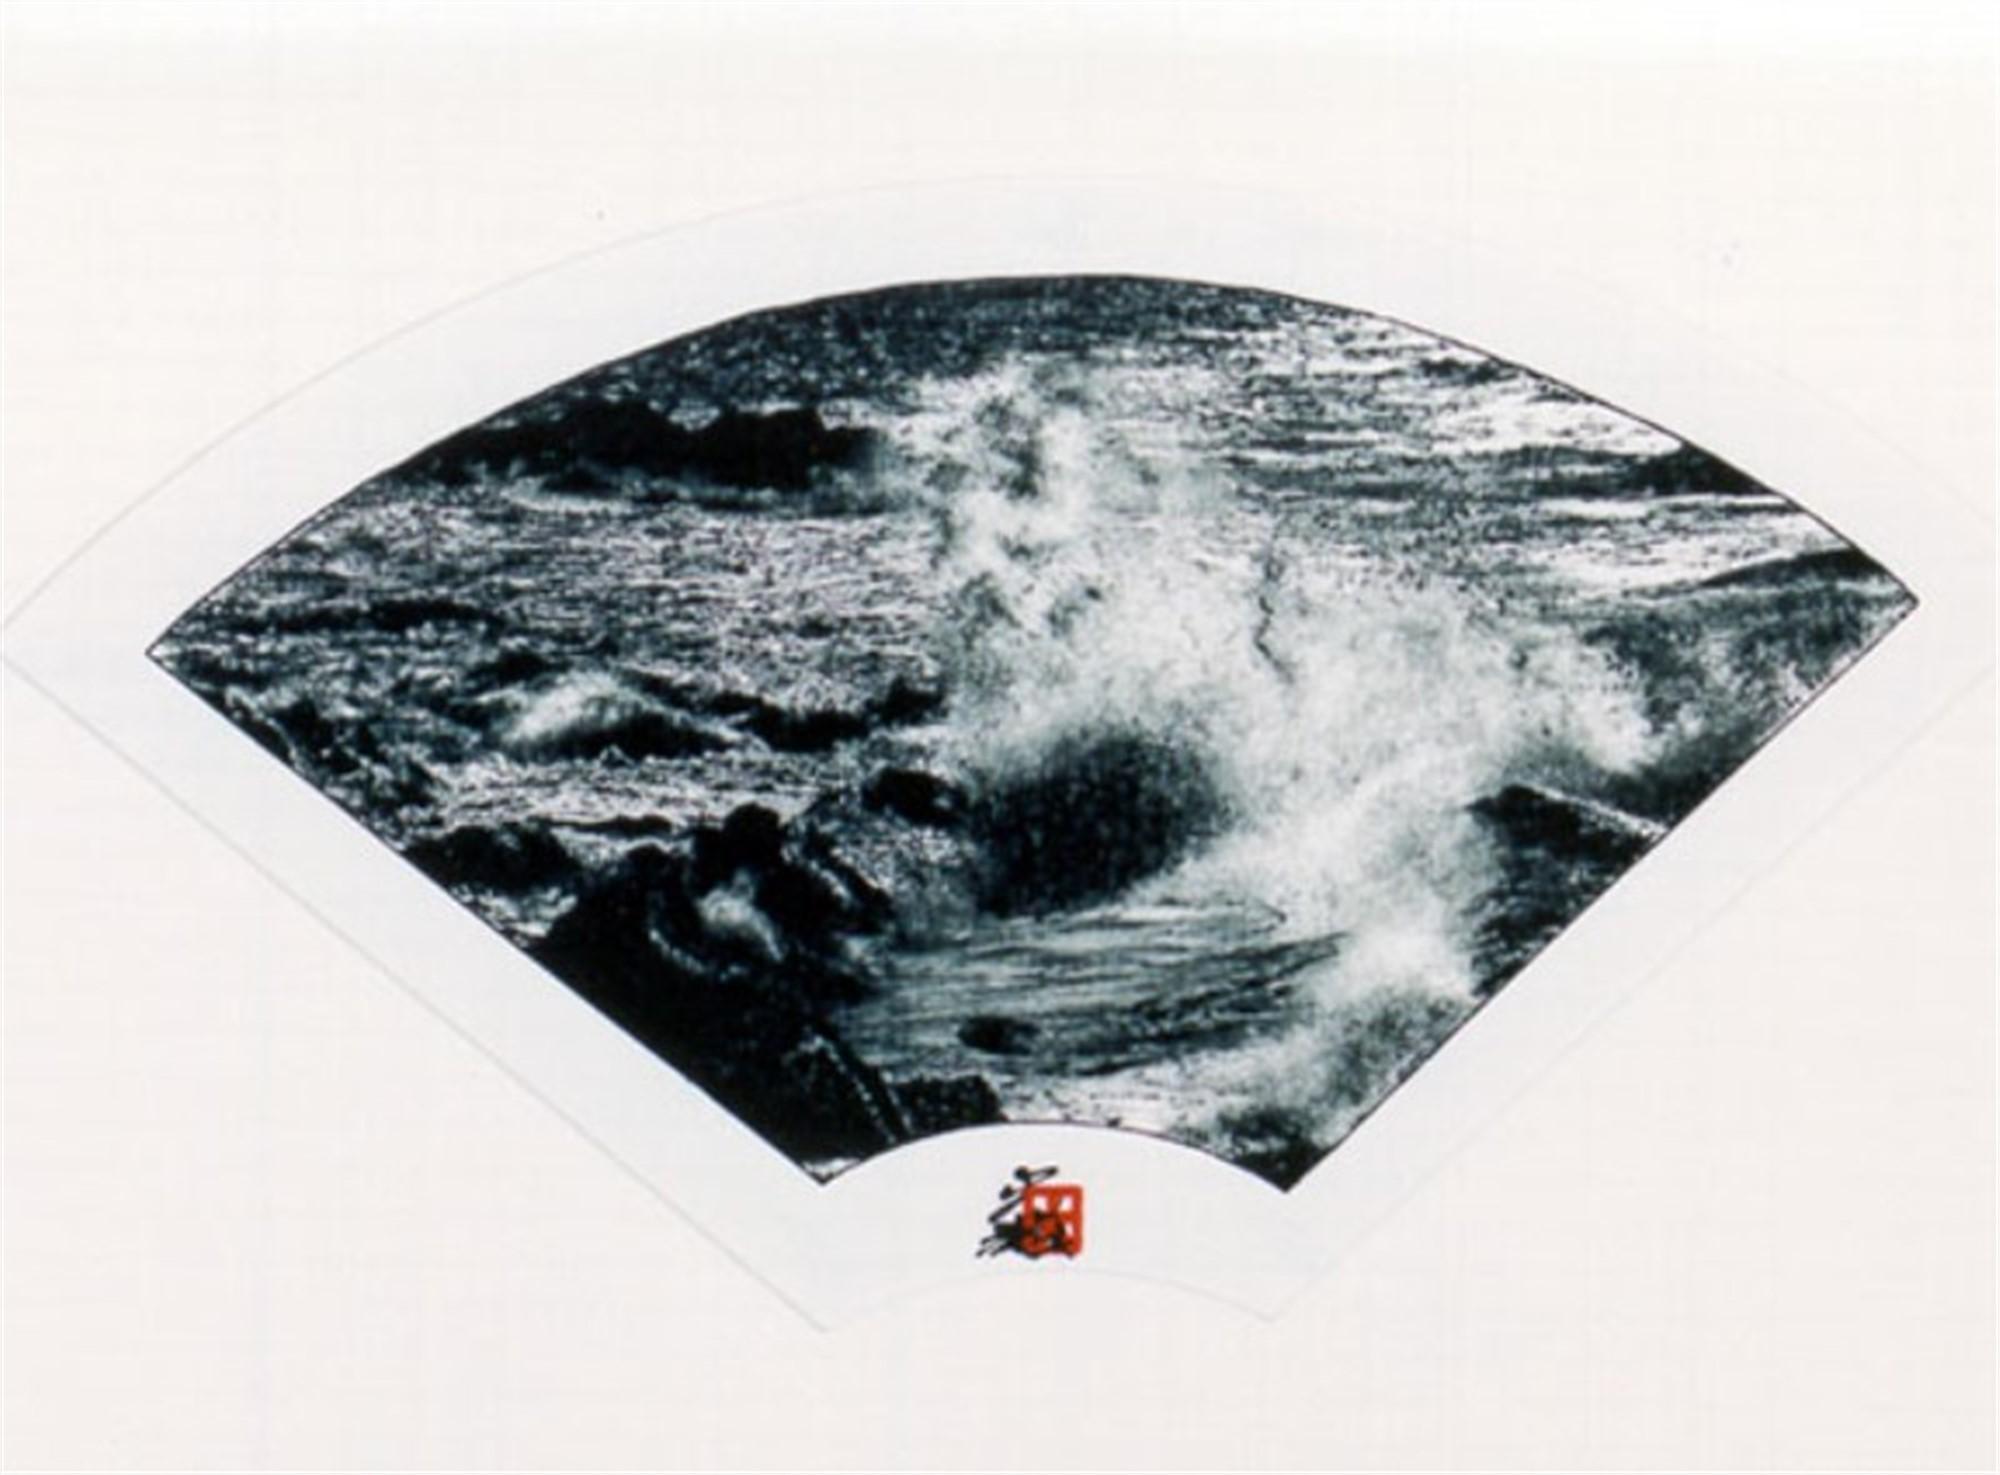 B/W Fan - Crashing Surf by Hisashi Otsuka